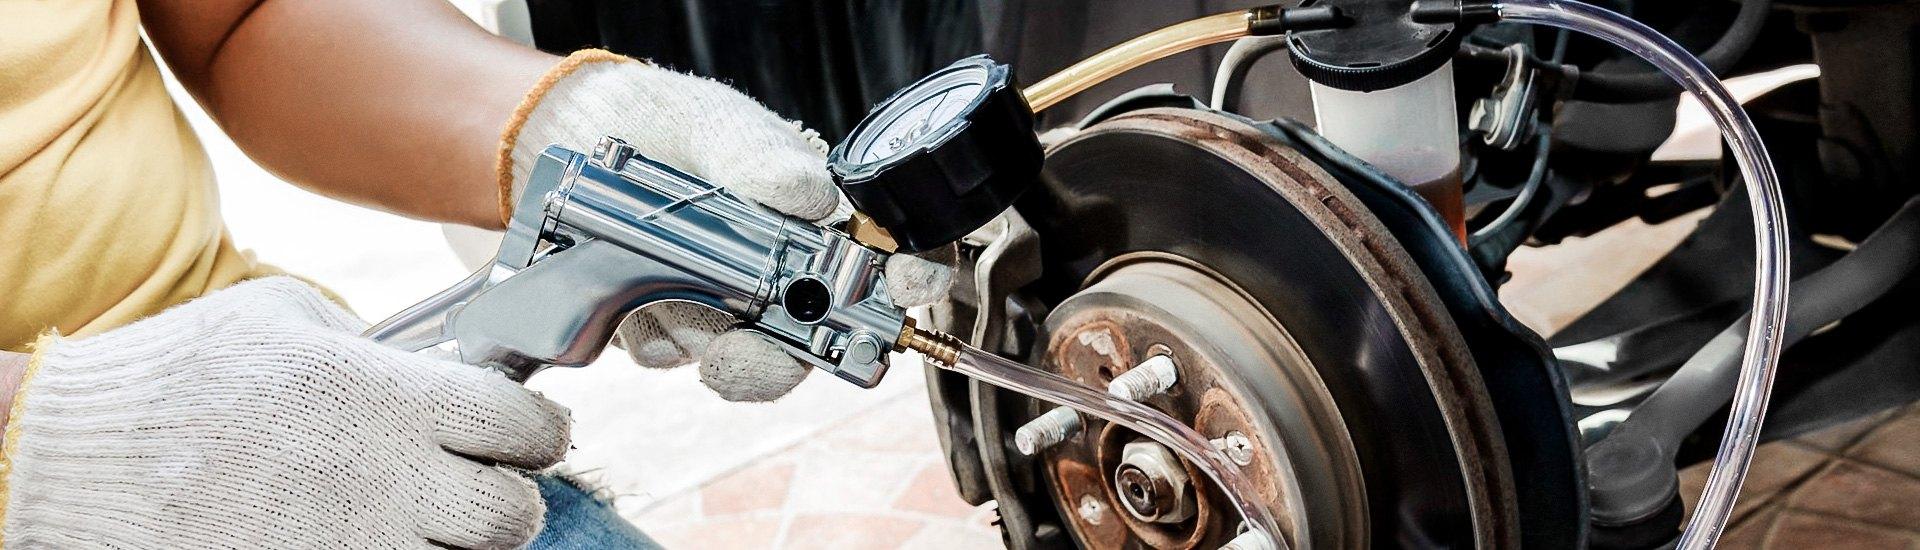 Brake Service Tools | Bleeding Kits, Flaring Tools, Pad